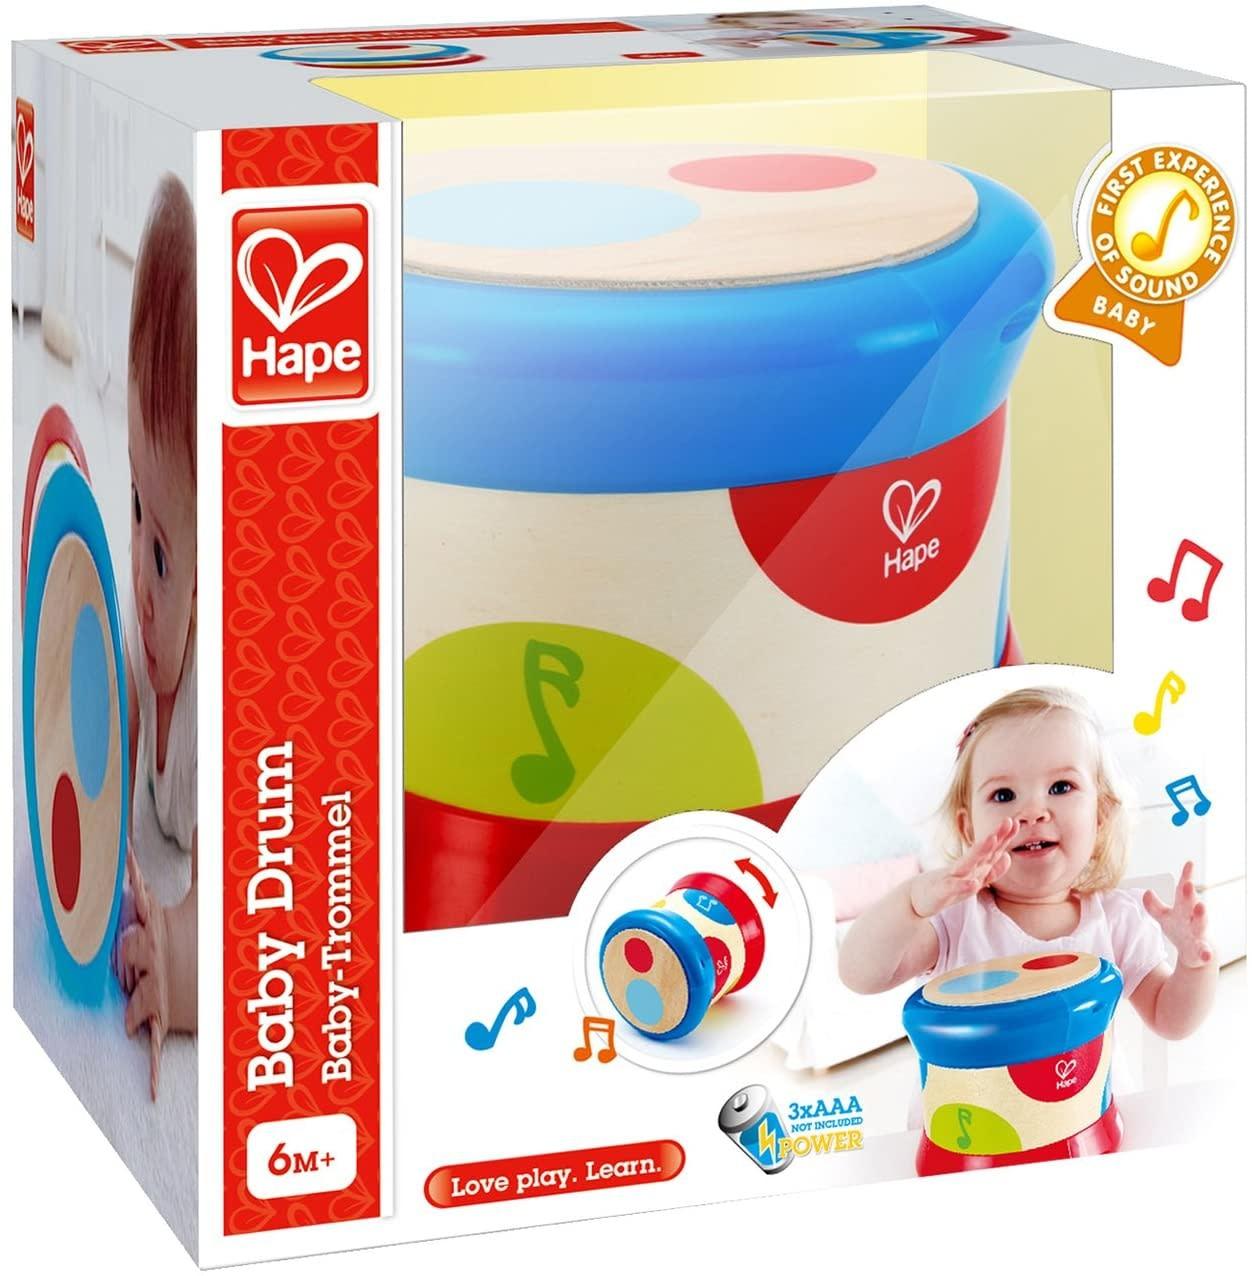 Hape Baby Drum-1